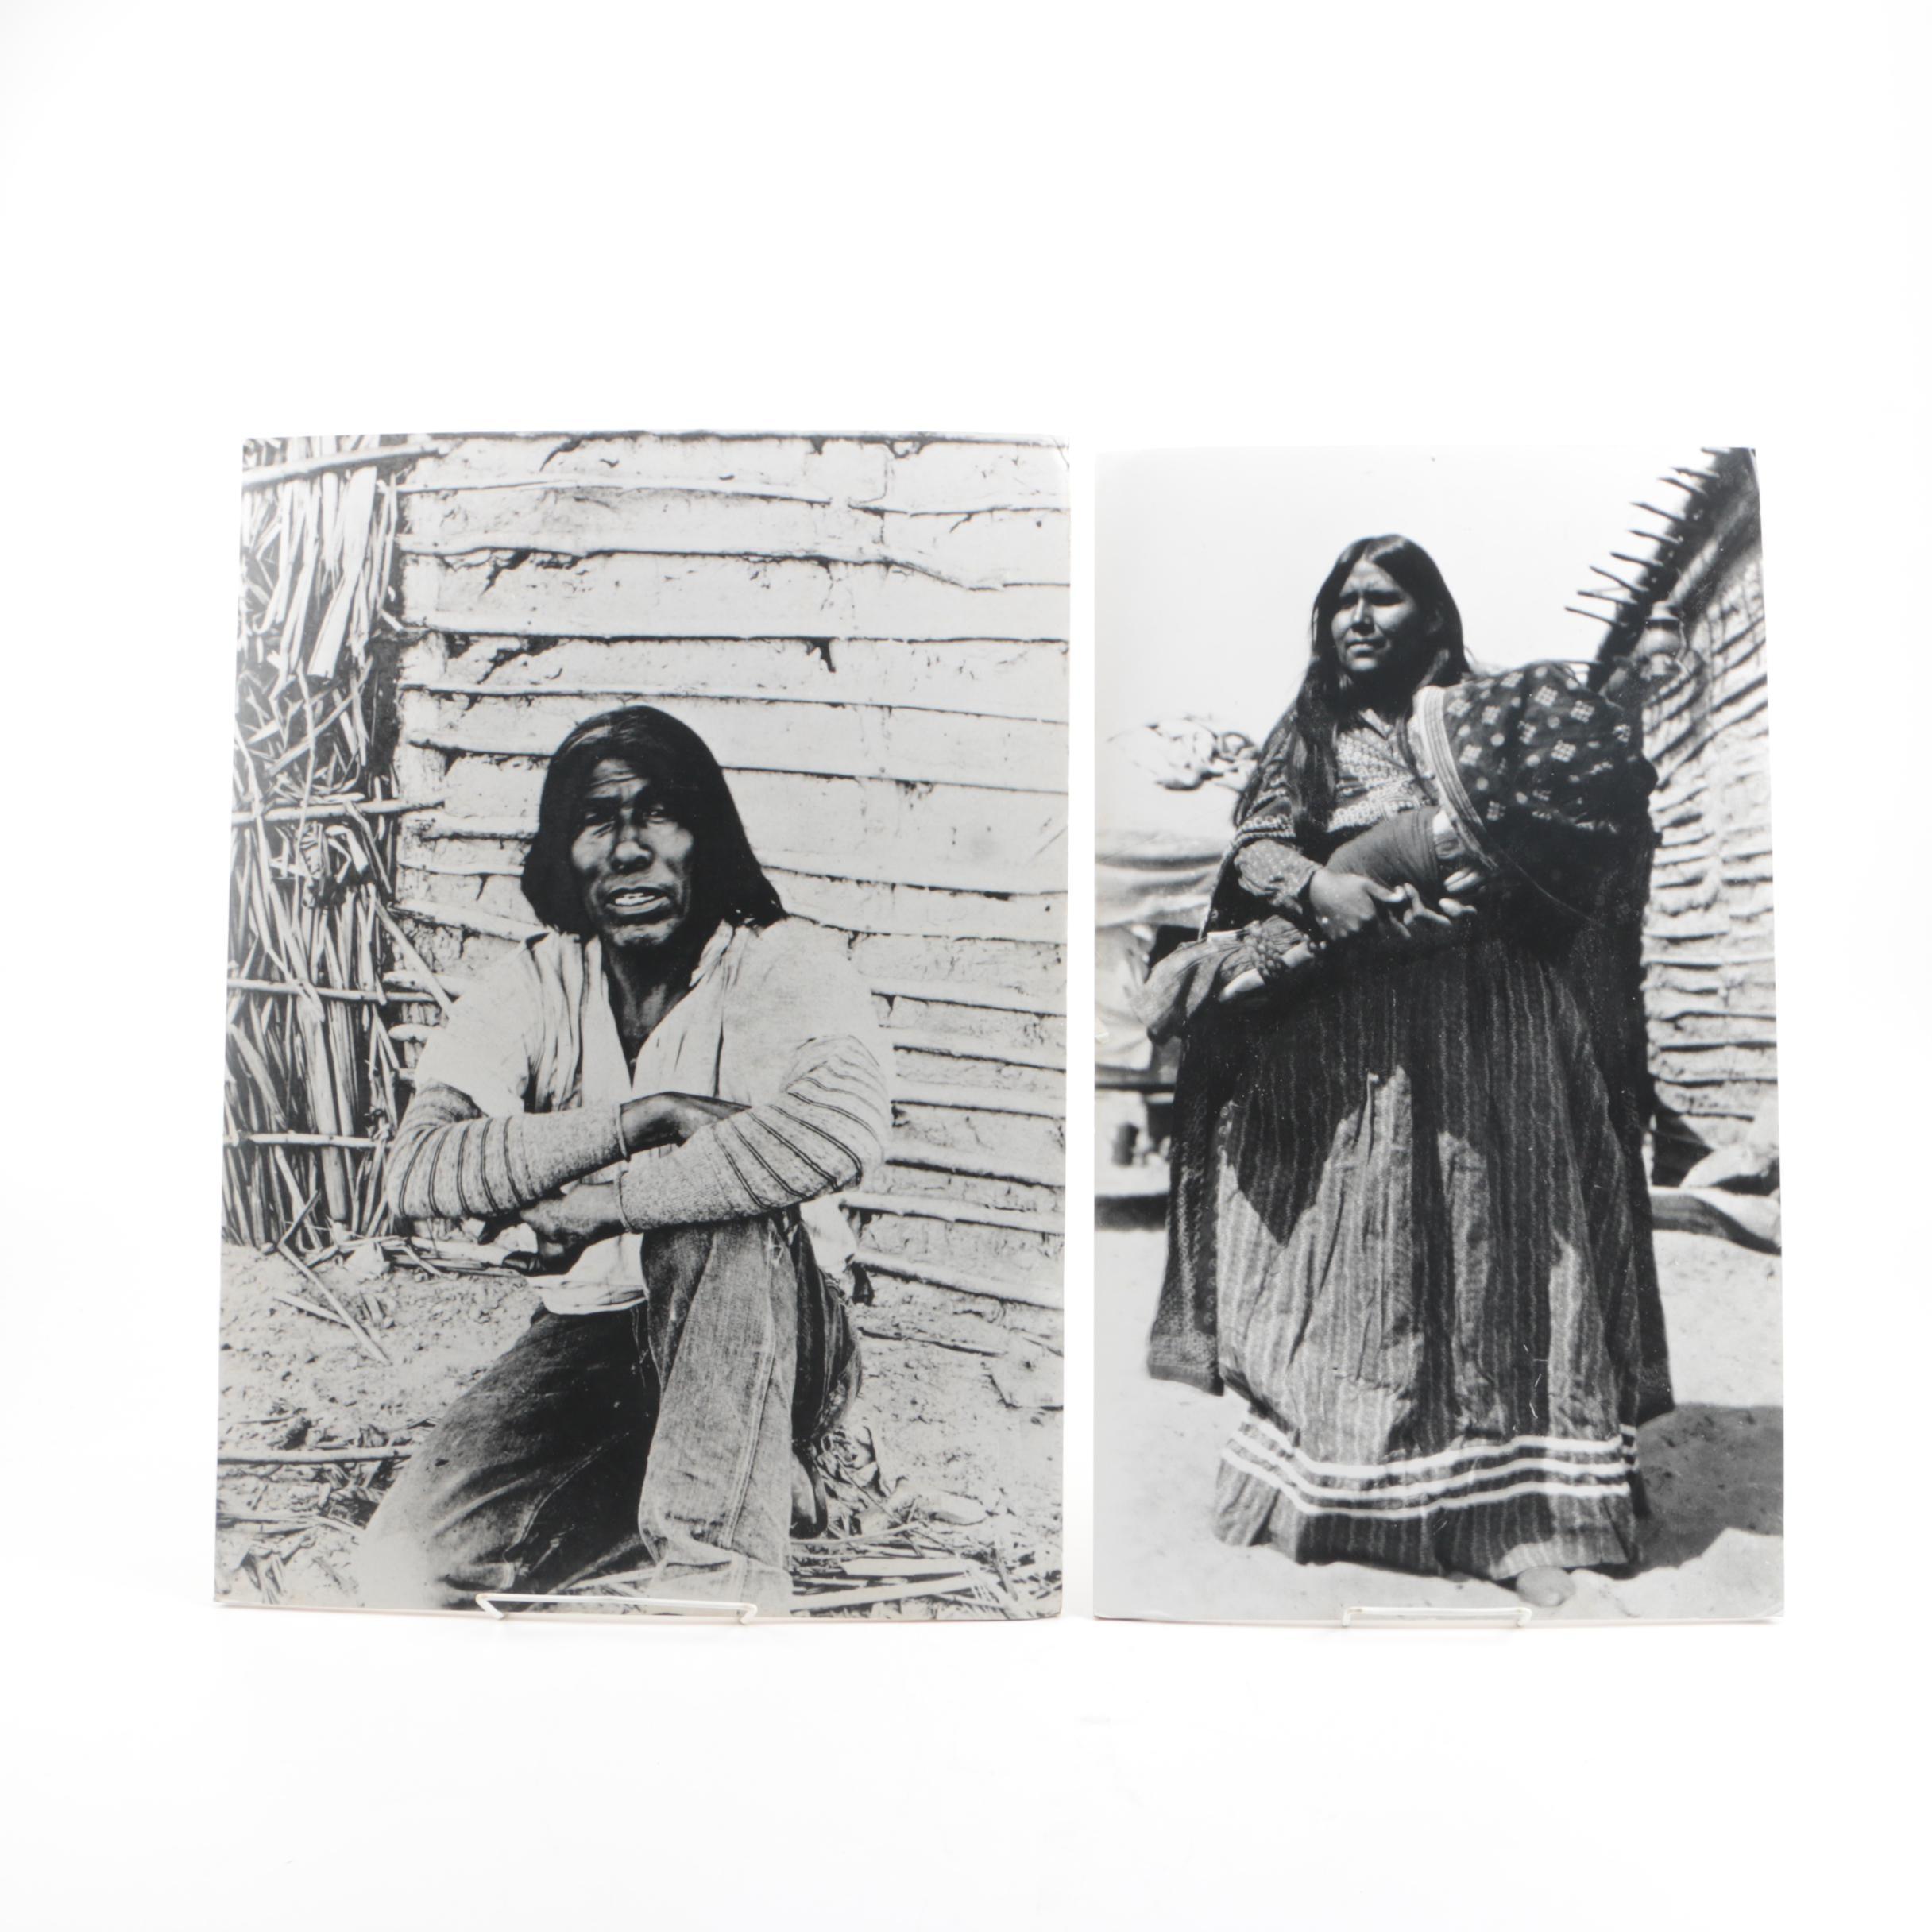 Ruby L. Archambeau Digital Photographs of Native American Figures